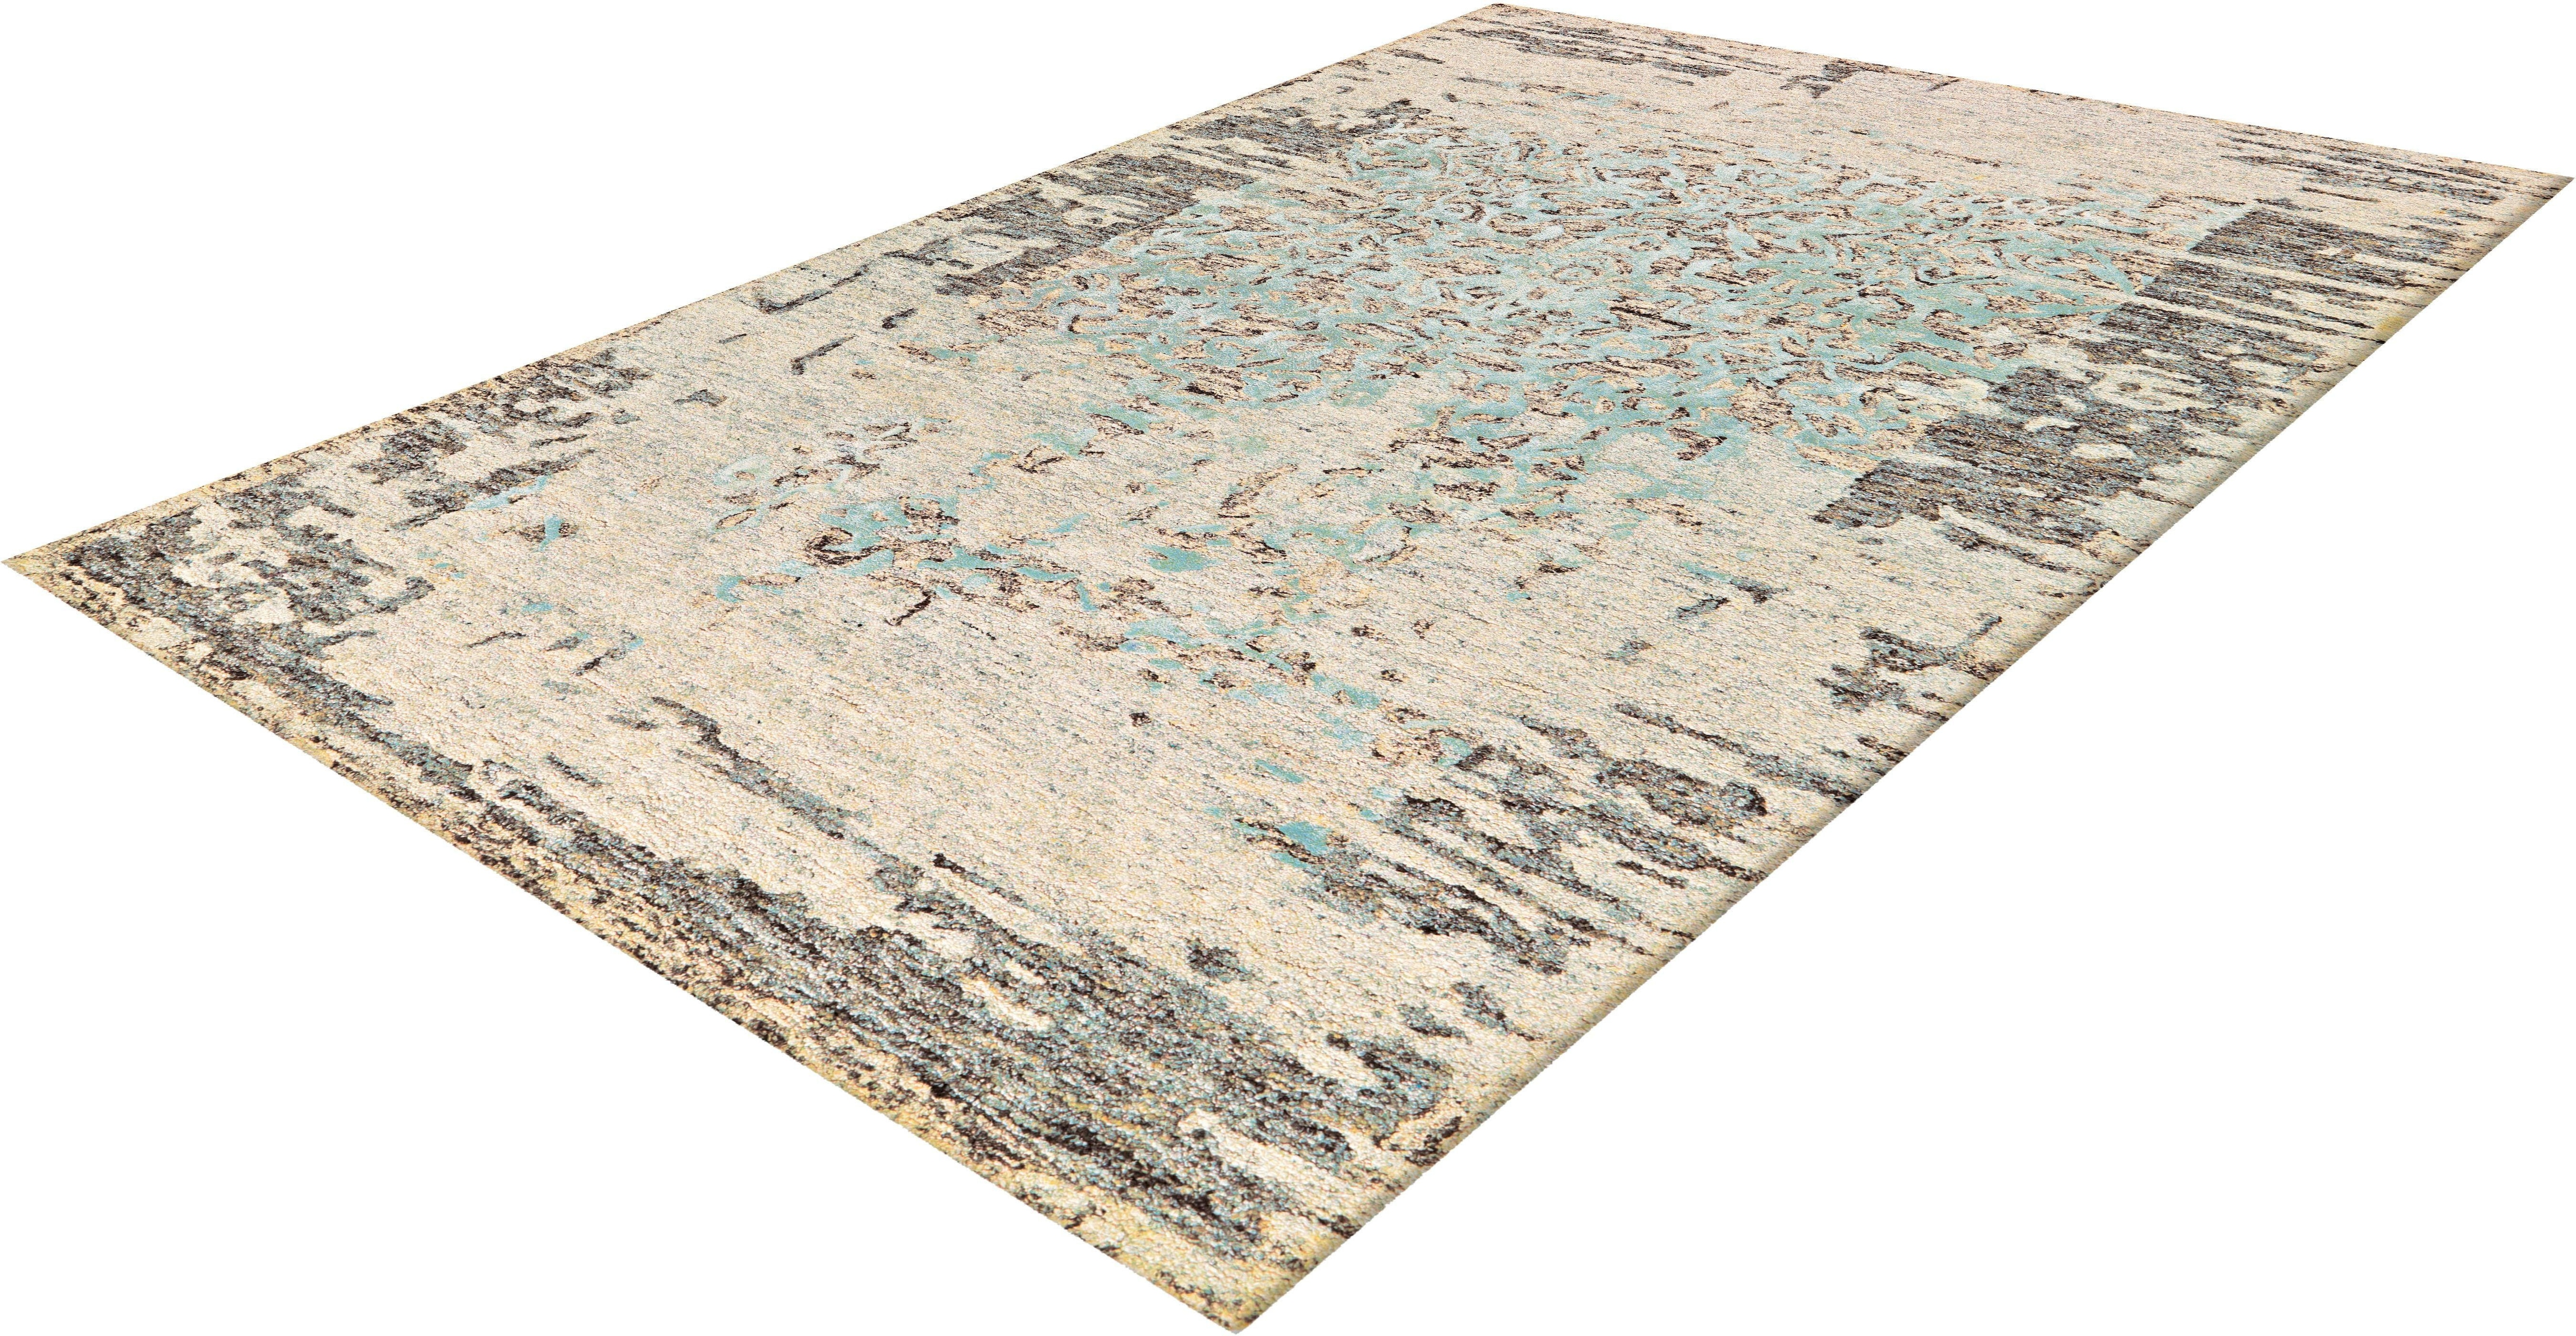 Teppich Shailene 1006 calo-deluxe rechteckig Höhe 12 mm handgetuftet